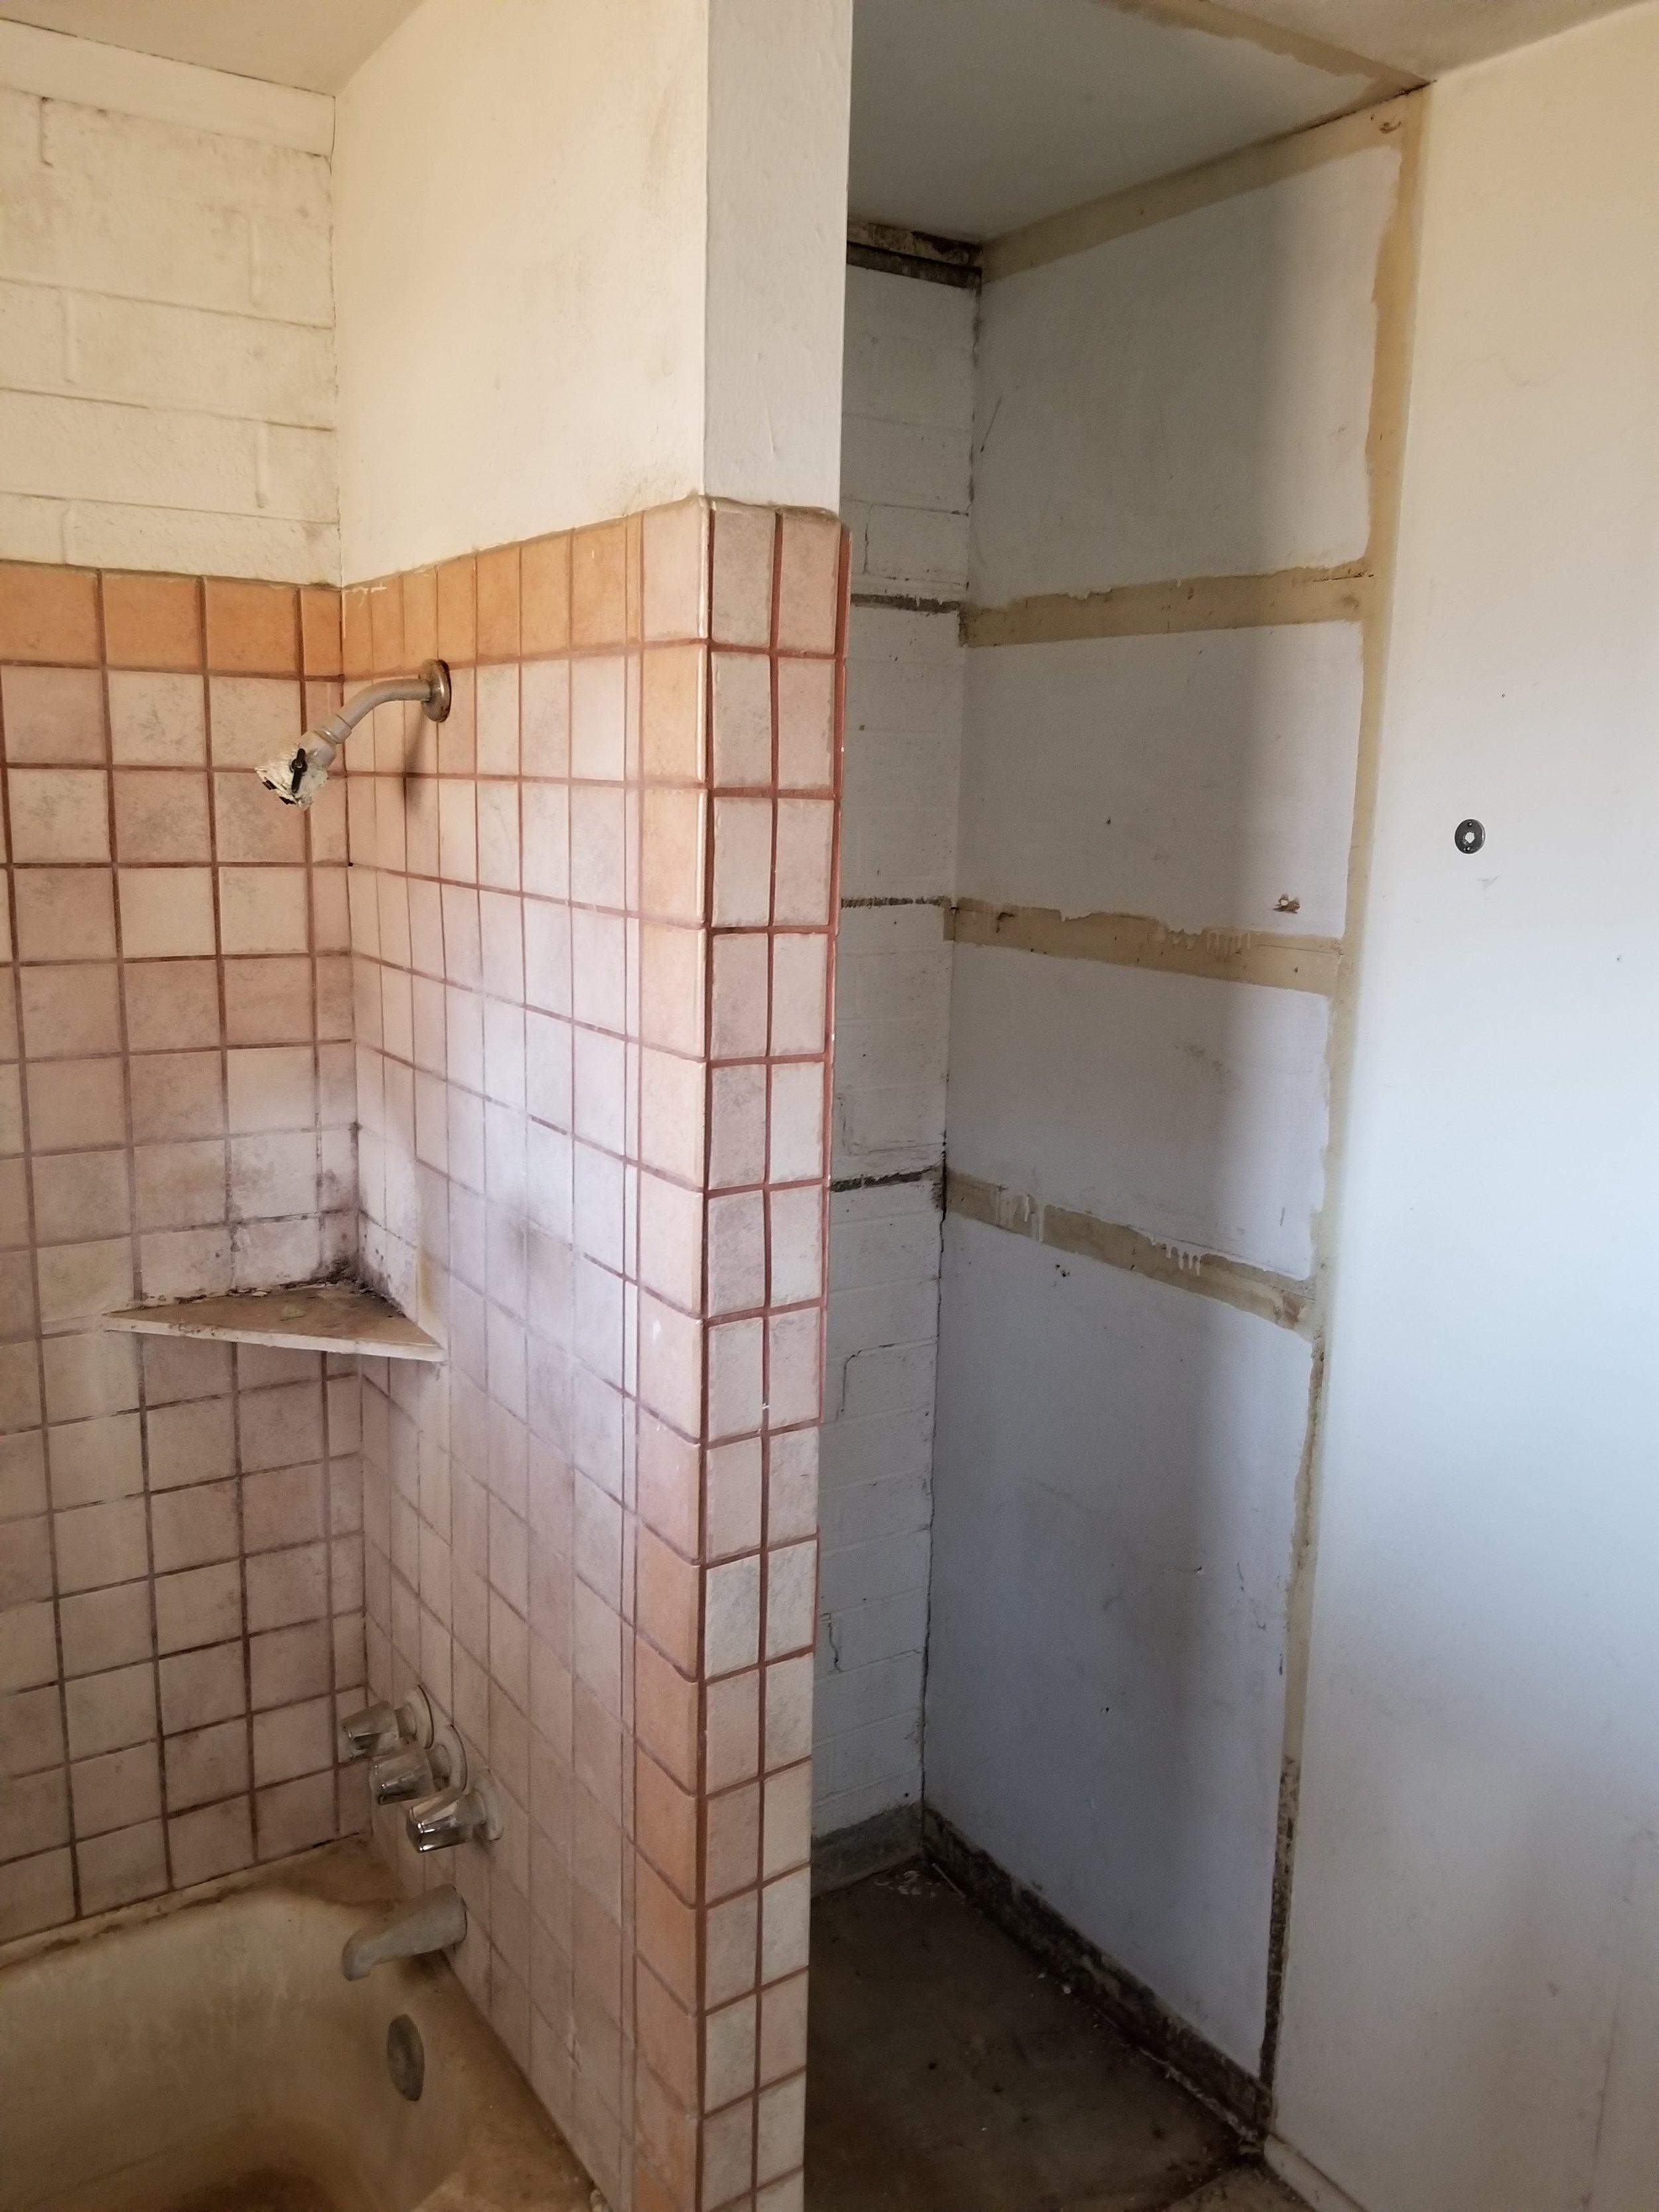 Demo bath cabinets